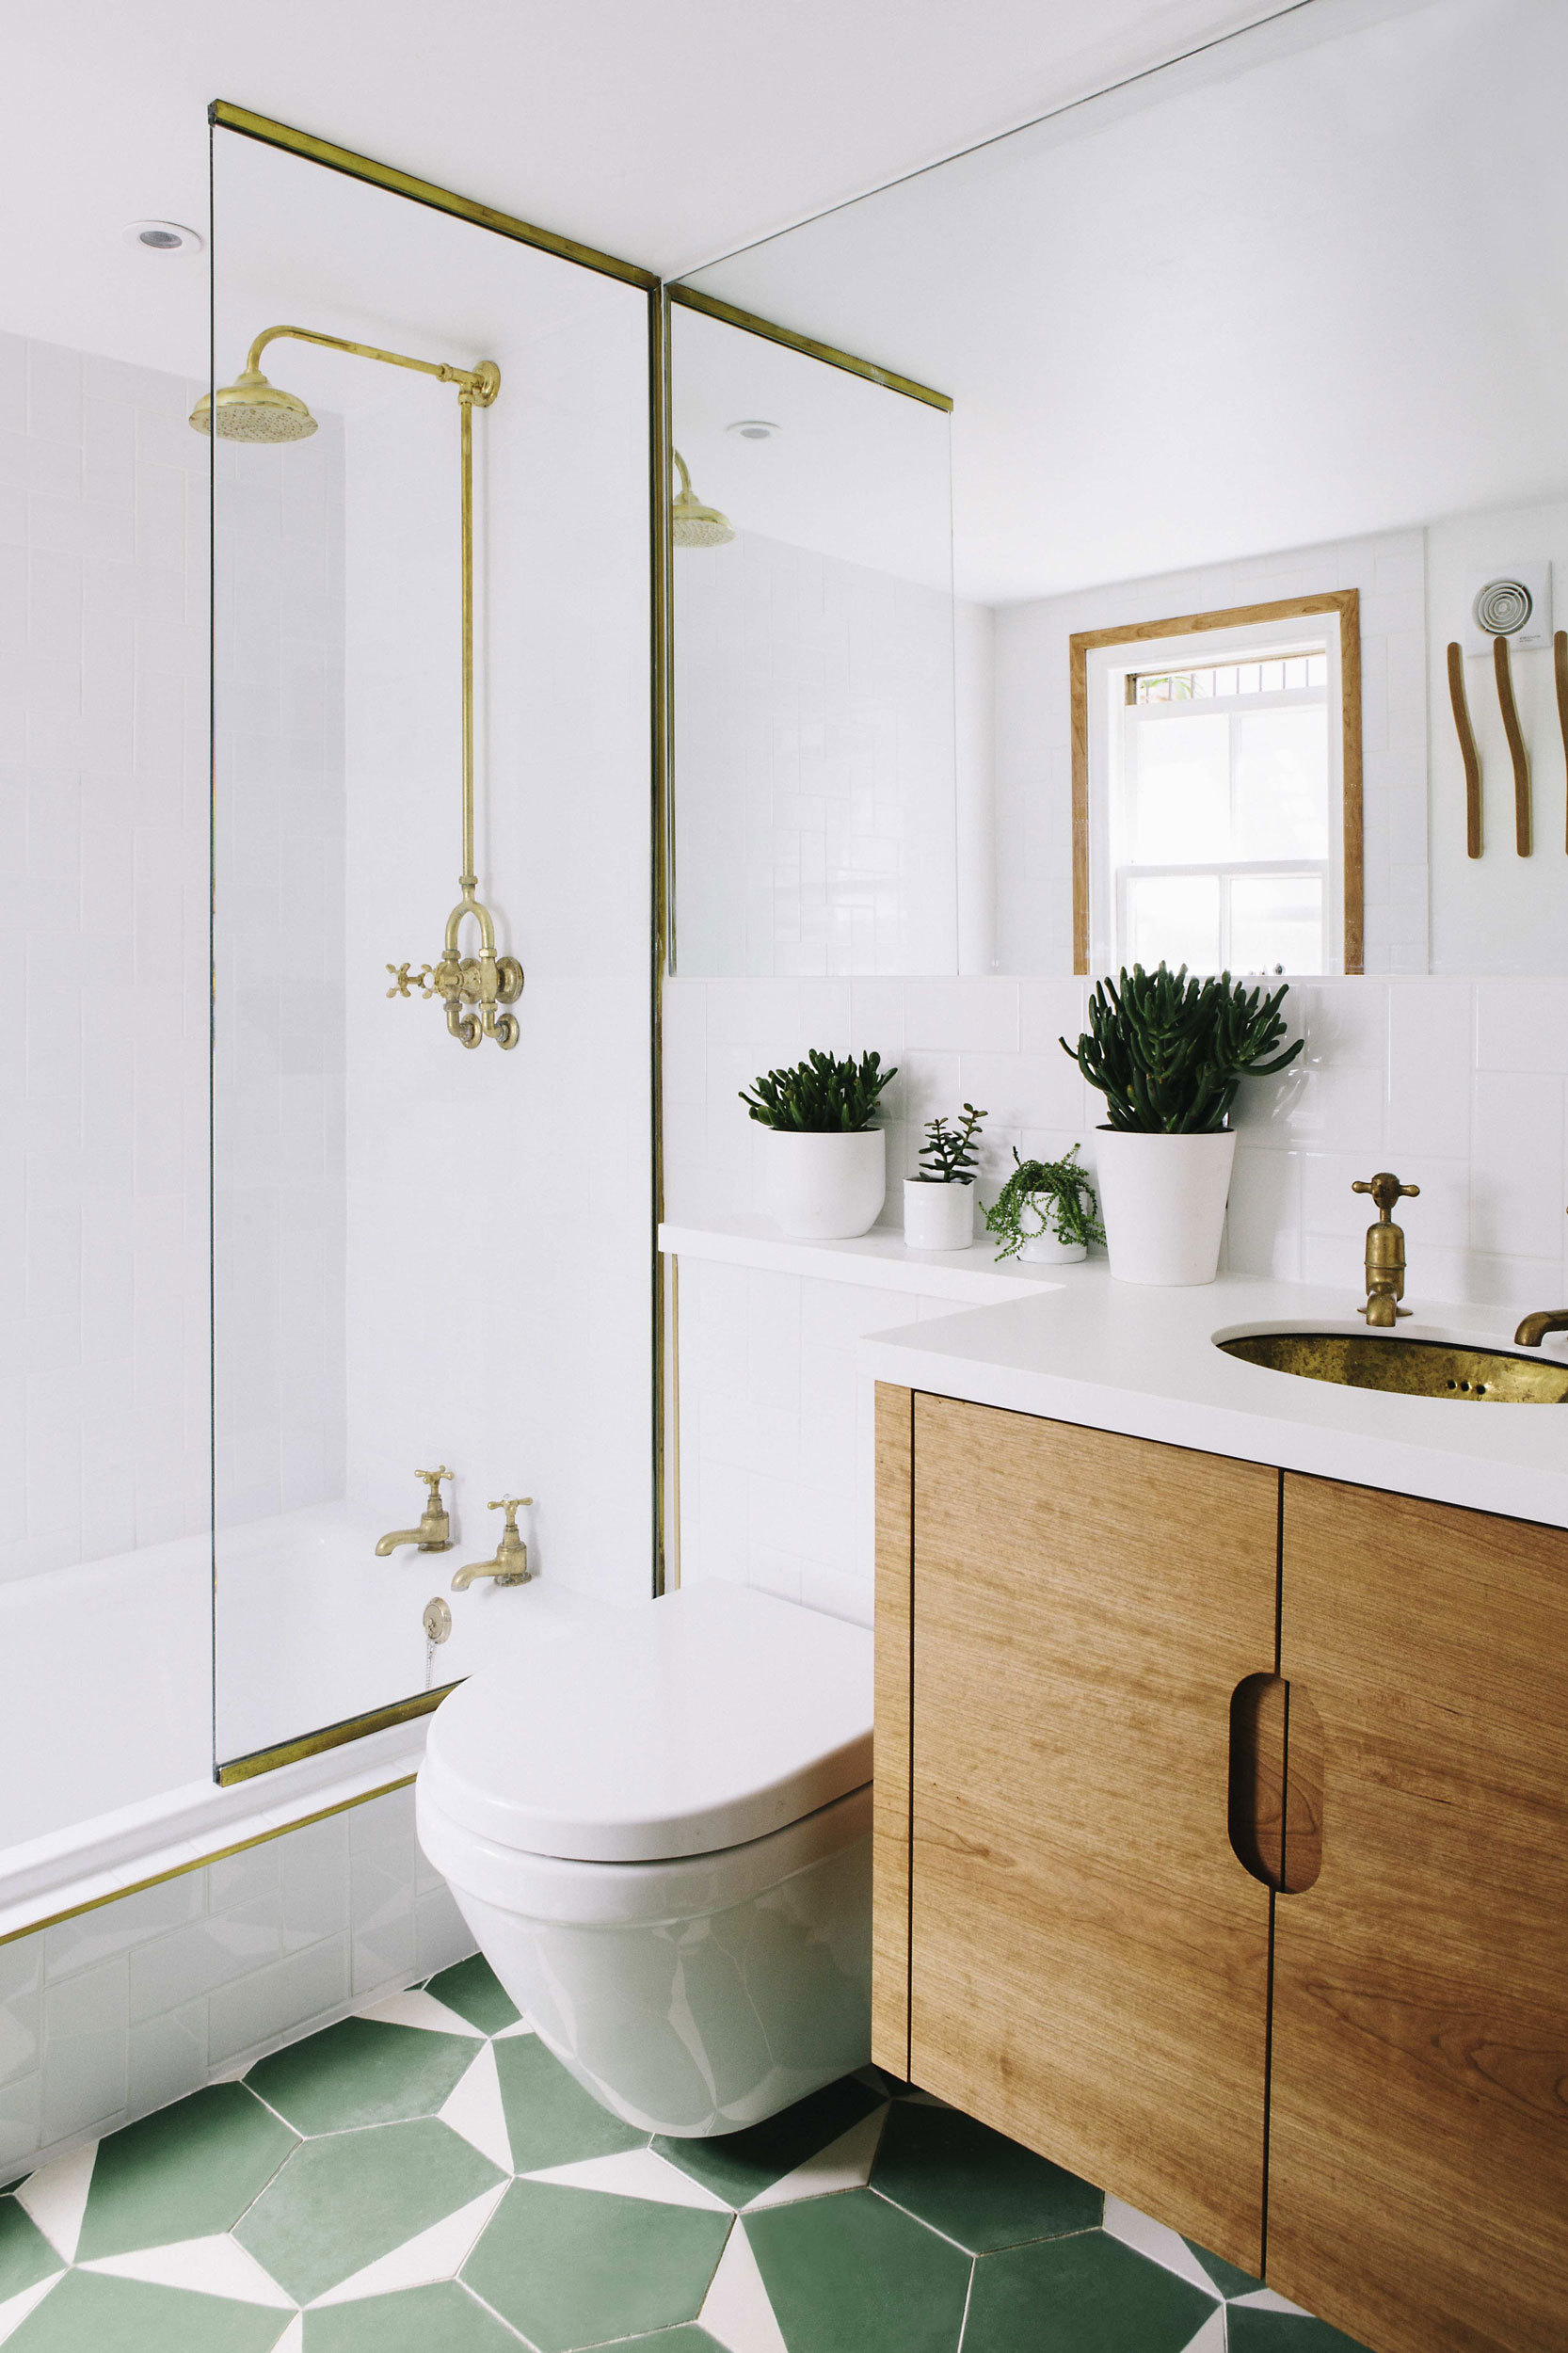 Bathroom Carpenter East Dulwich - West & Reid